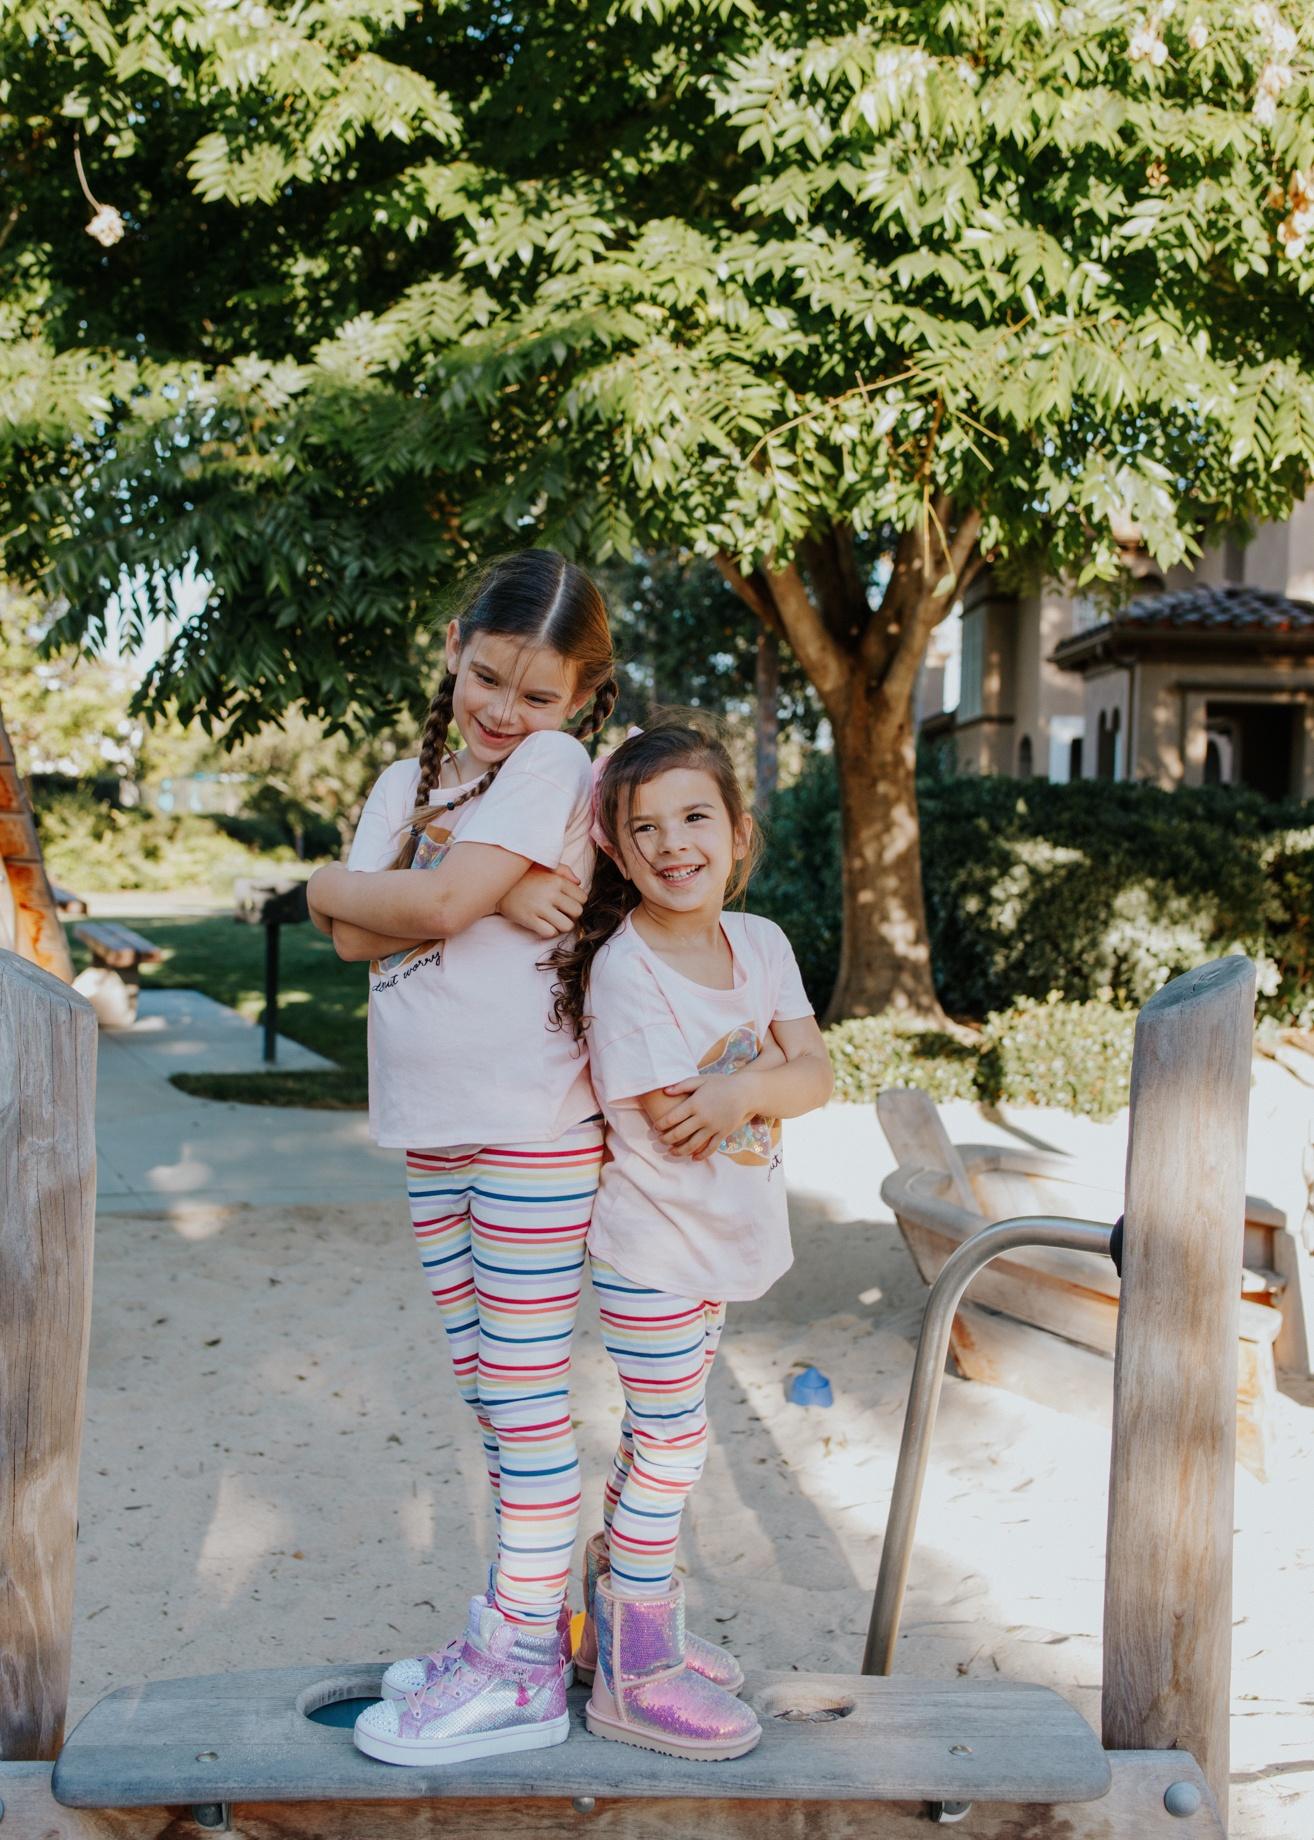 Top Kids Picks Of The Nordstrom Anniversary Sale - Mint Arrow